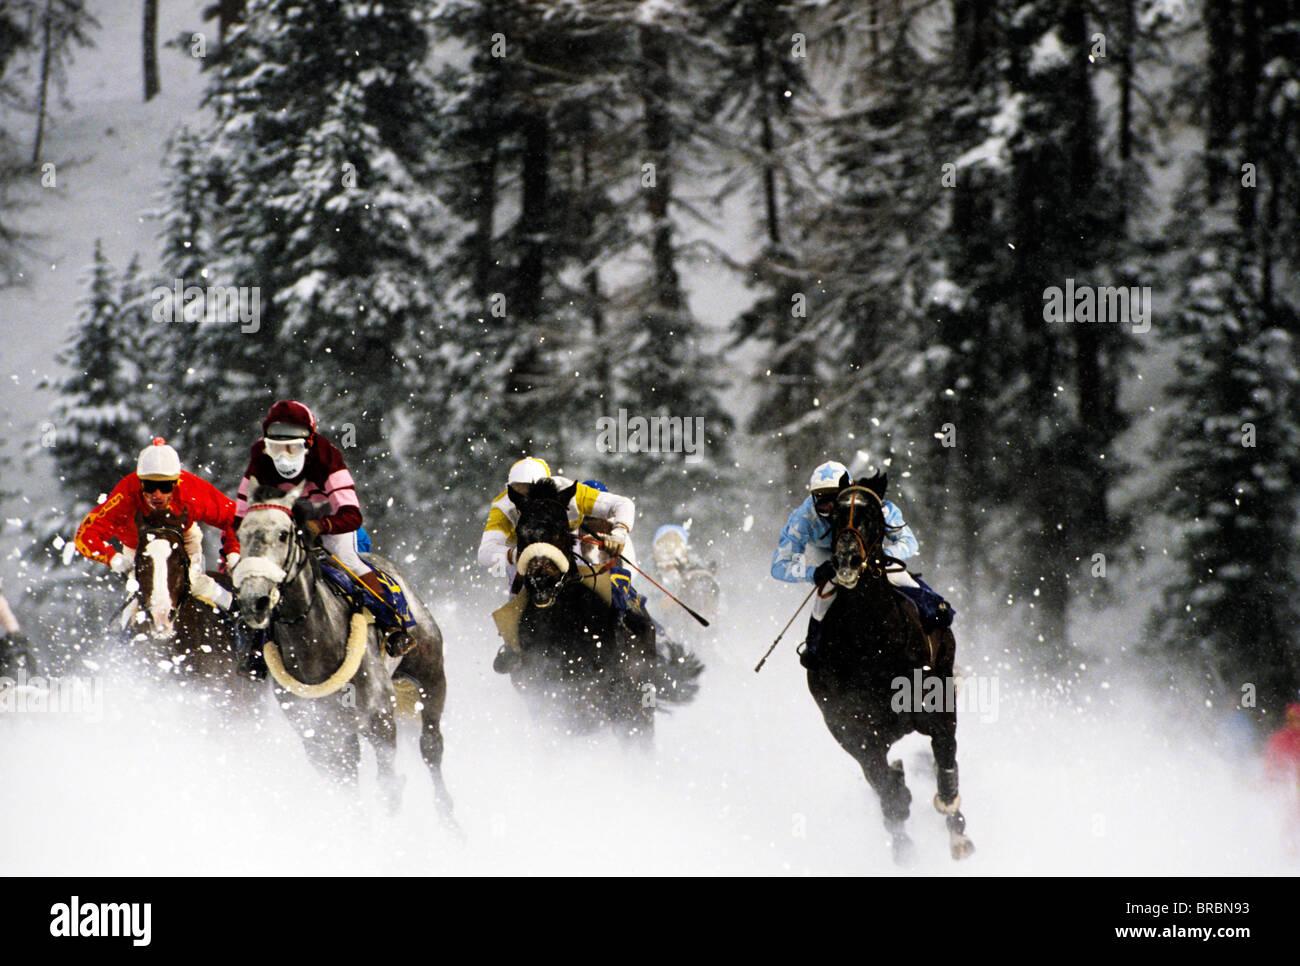 Group of horses and jockeys in masks and hardhats take corner towards the finish line - Stock Image